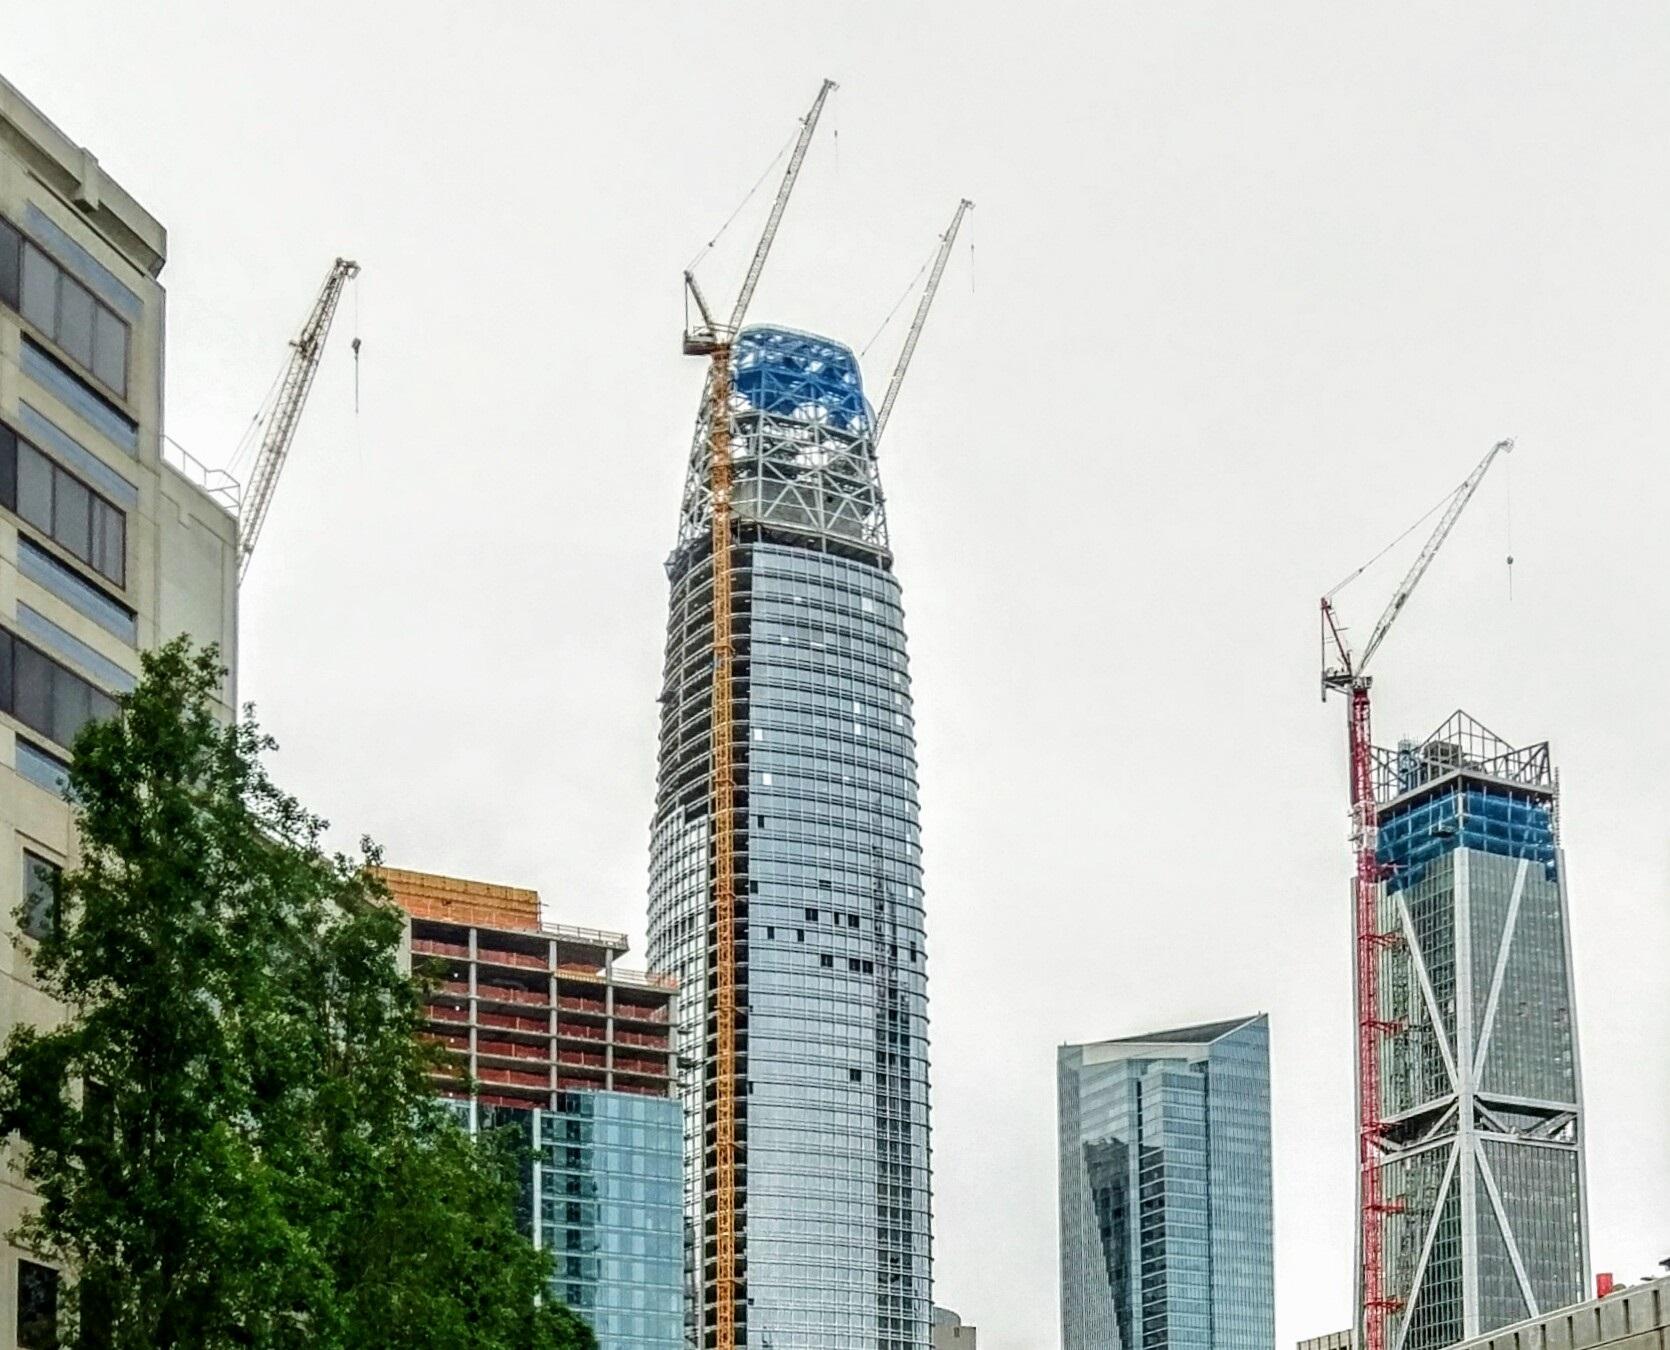 Office space development skyscrapers